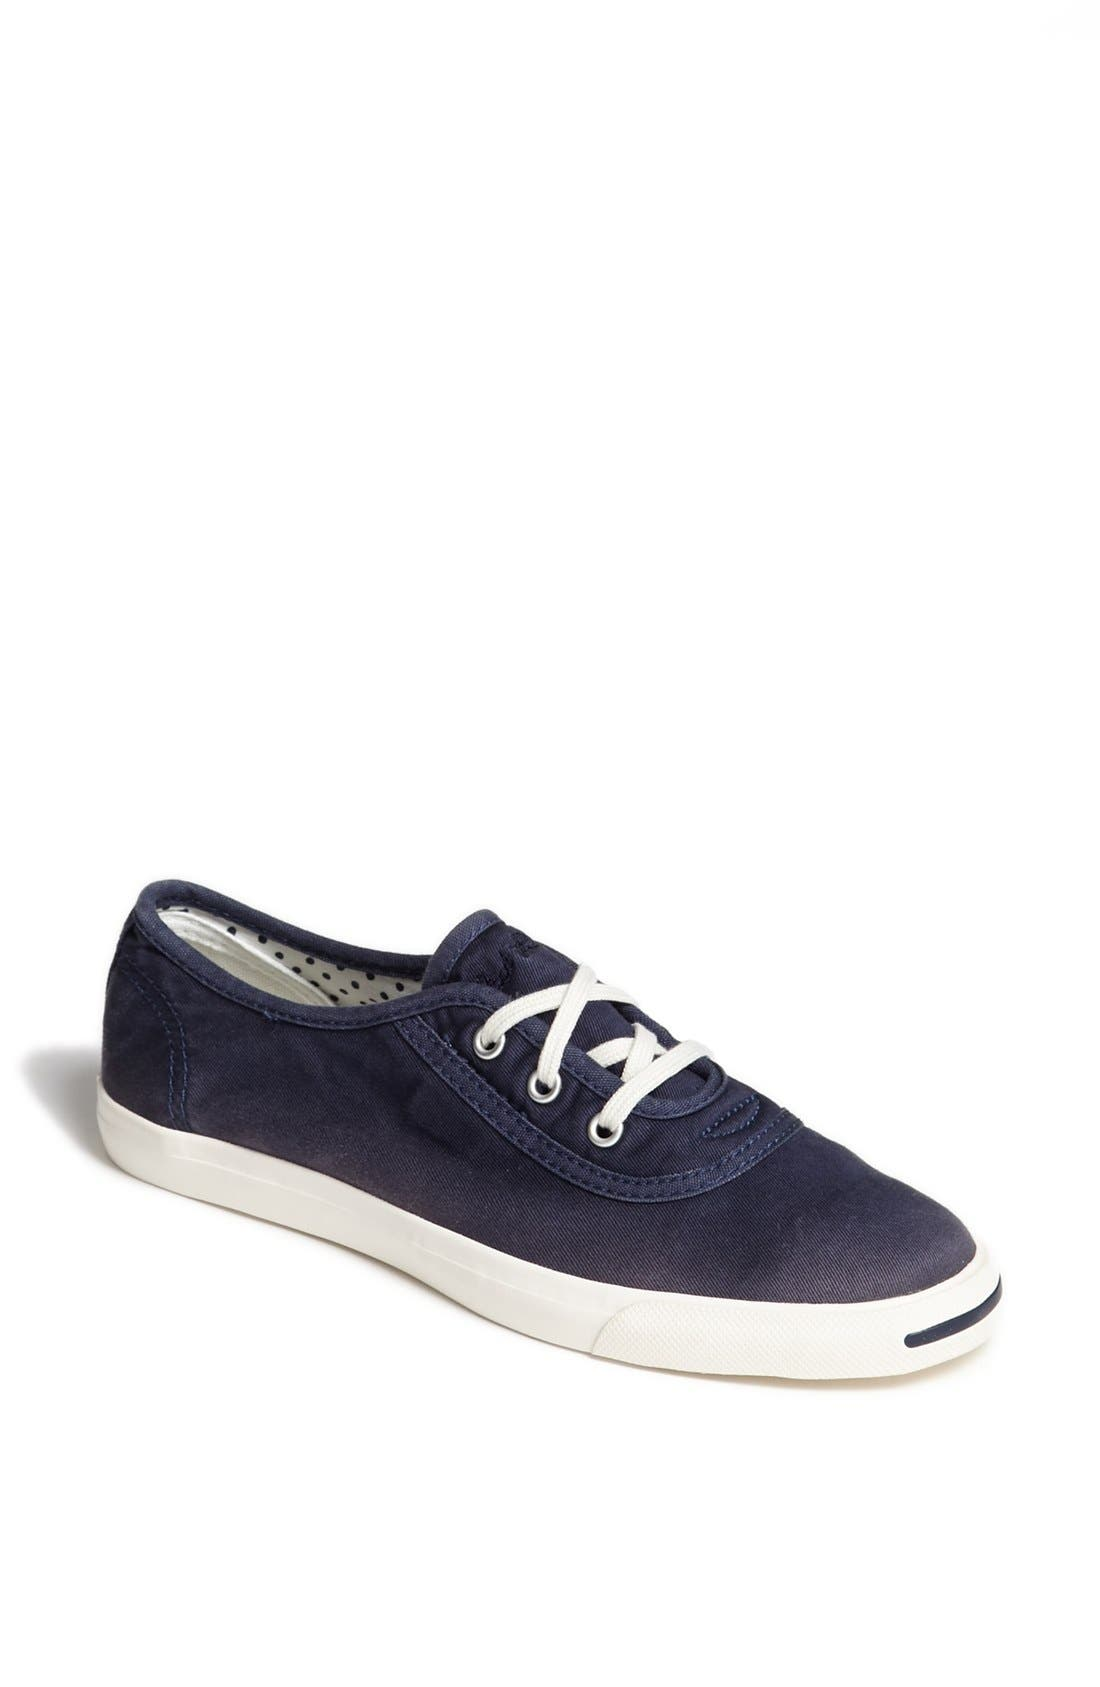 Alternate Image 1 Selected - Converse 'Jack Purcell - Jane' Sneaker (Women)